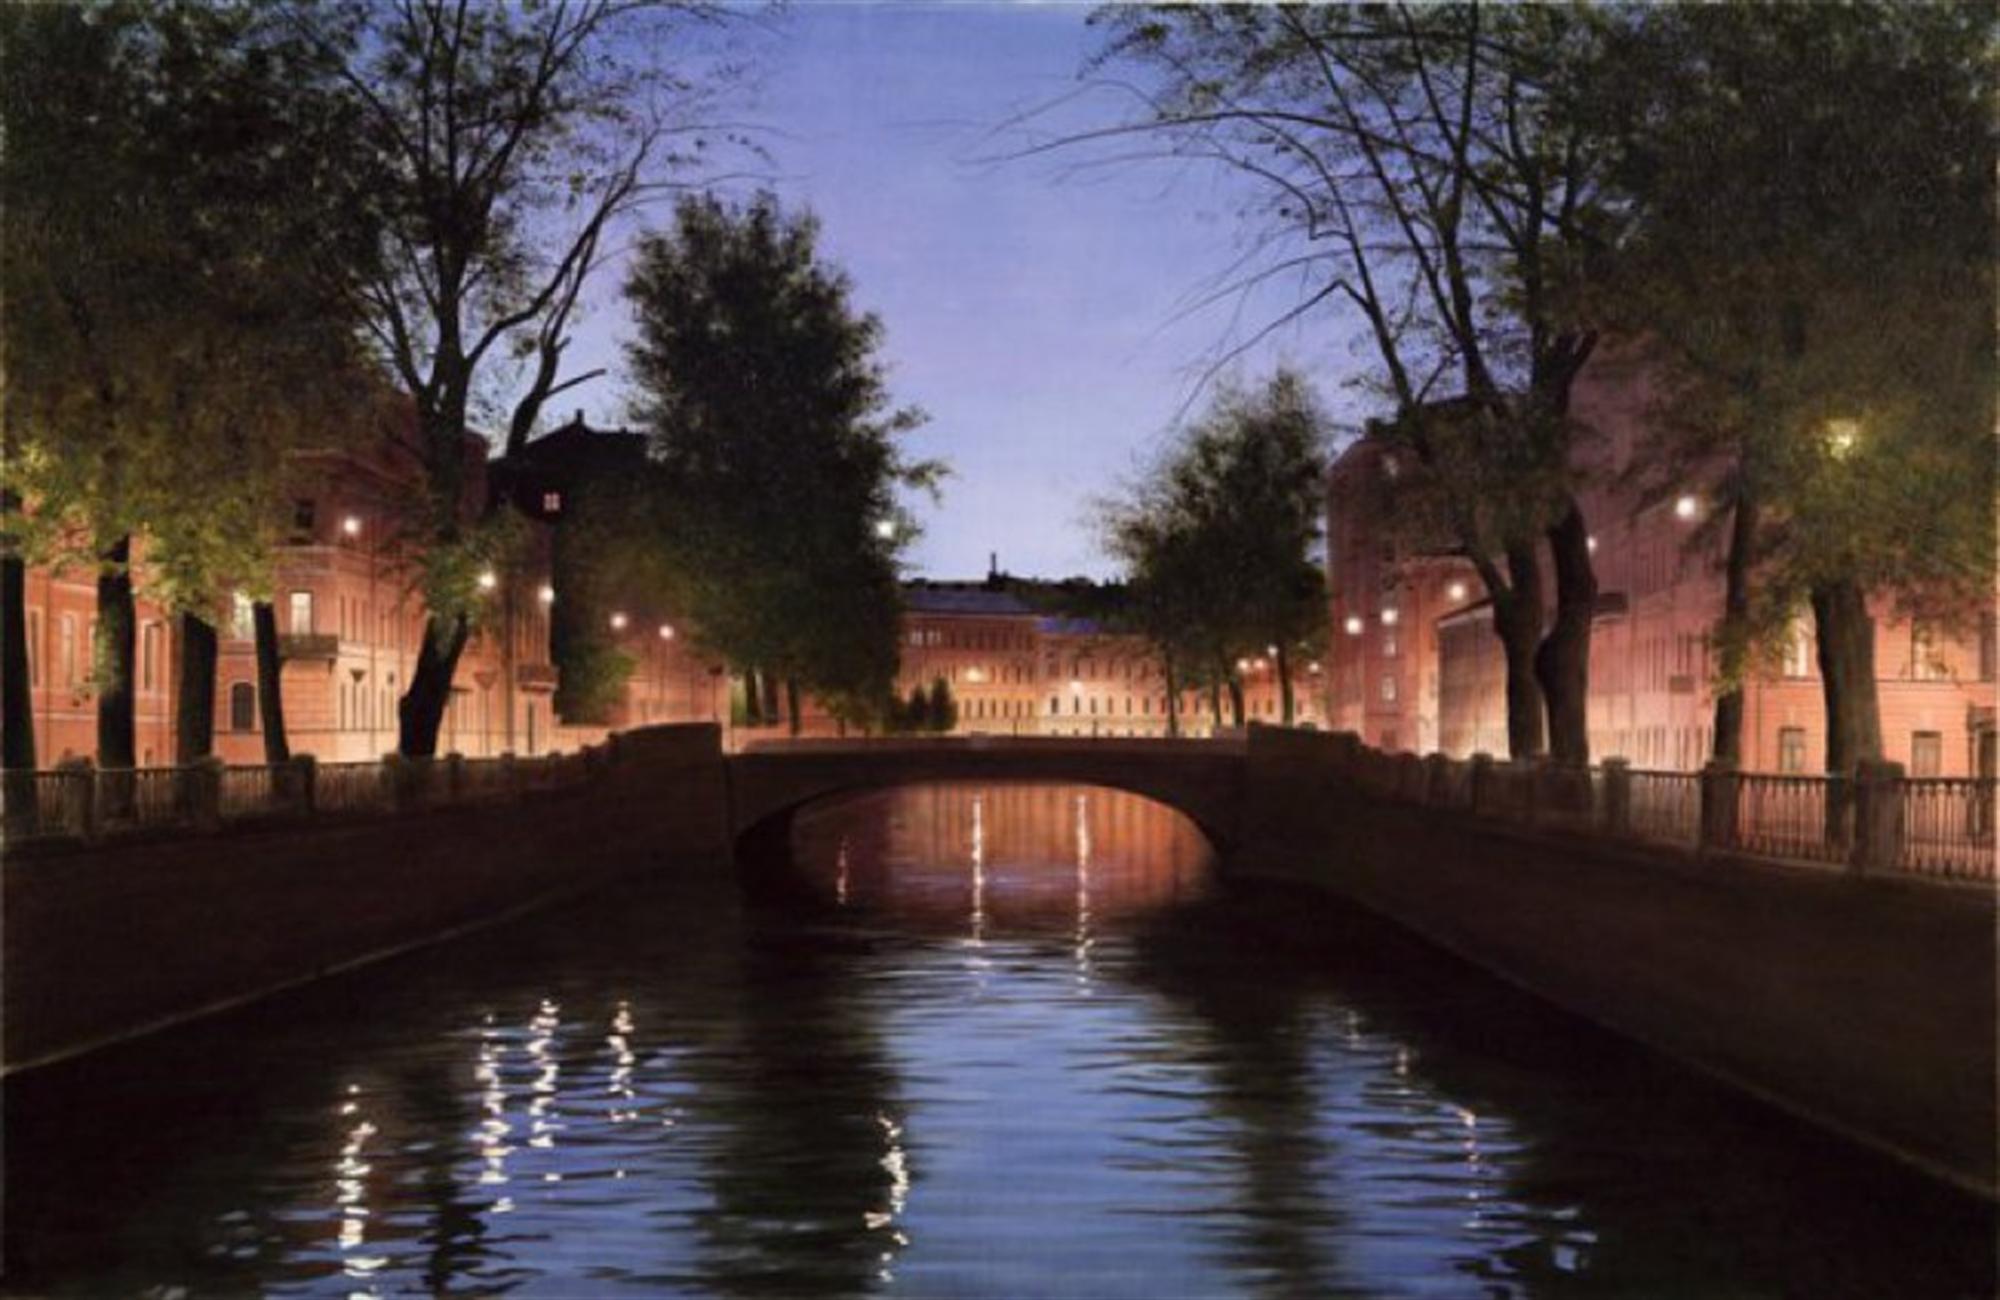 Northern Venice by Alexander Volkov